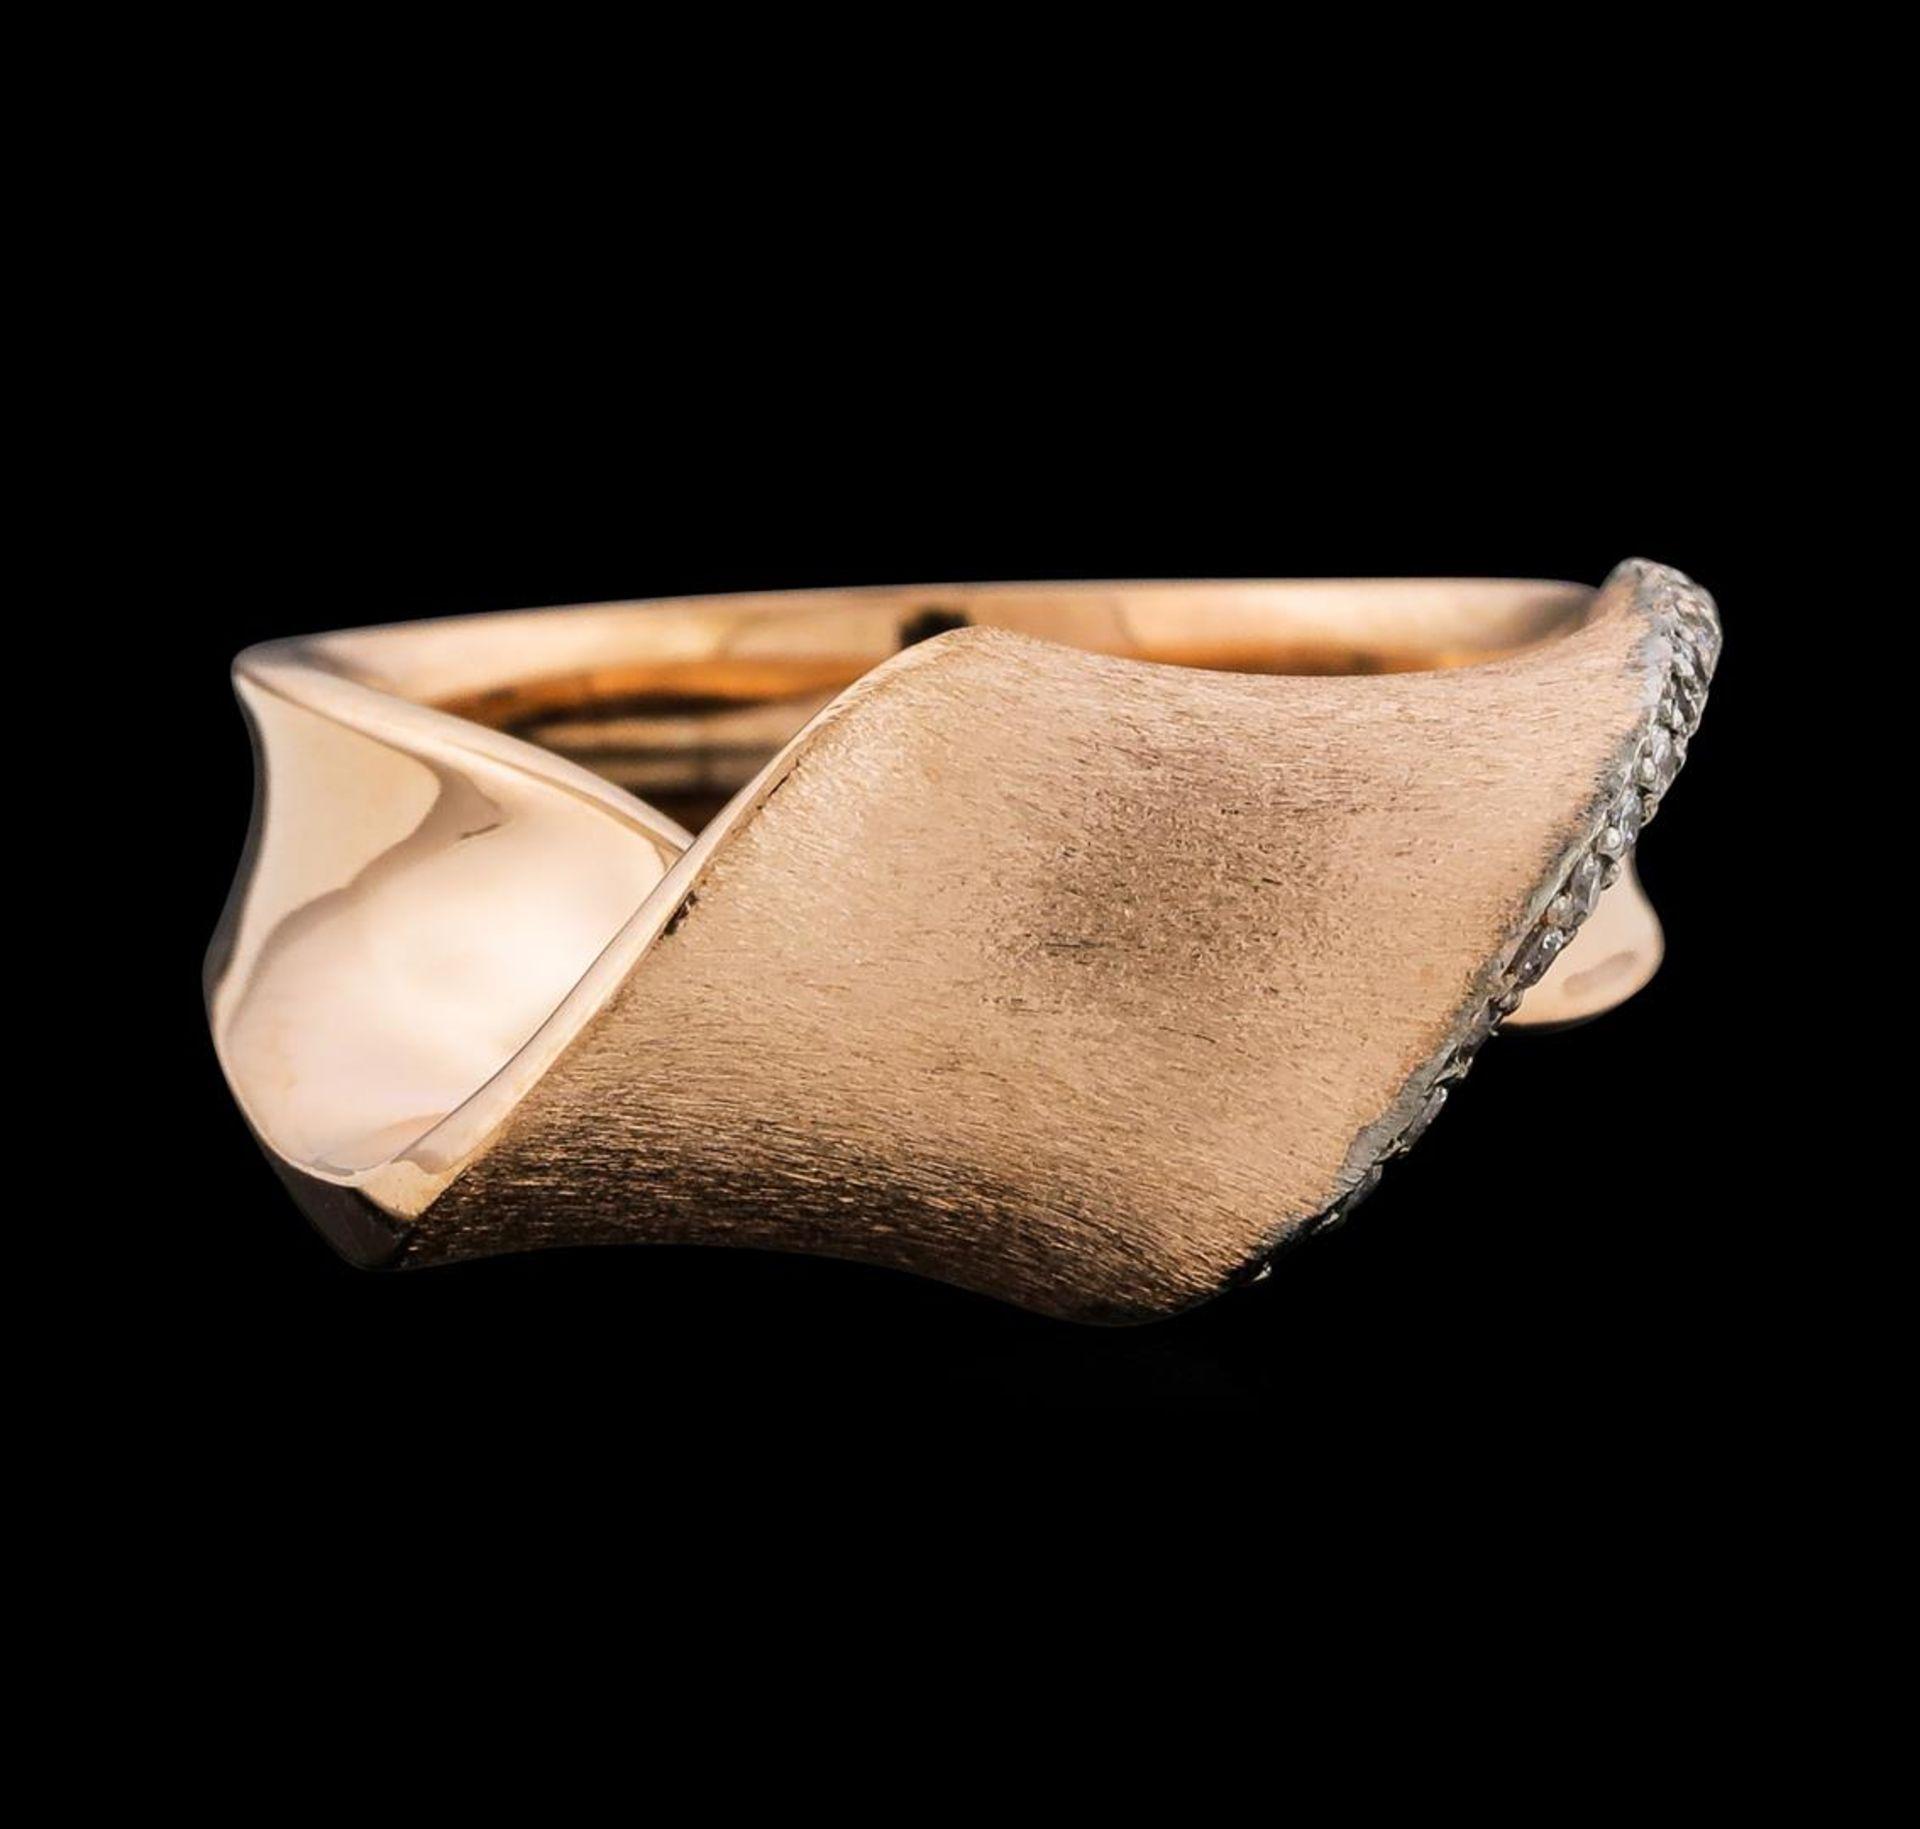 0.15 ctw Diamond Ring - 14KT Rose Gold - Image 2 of 4